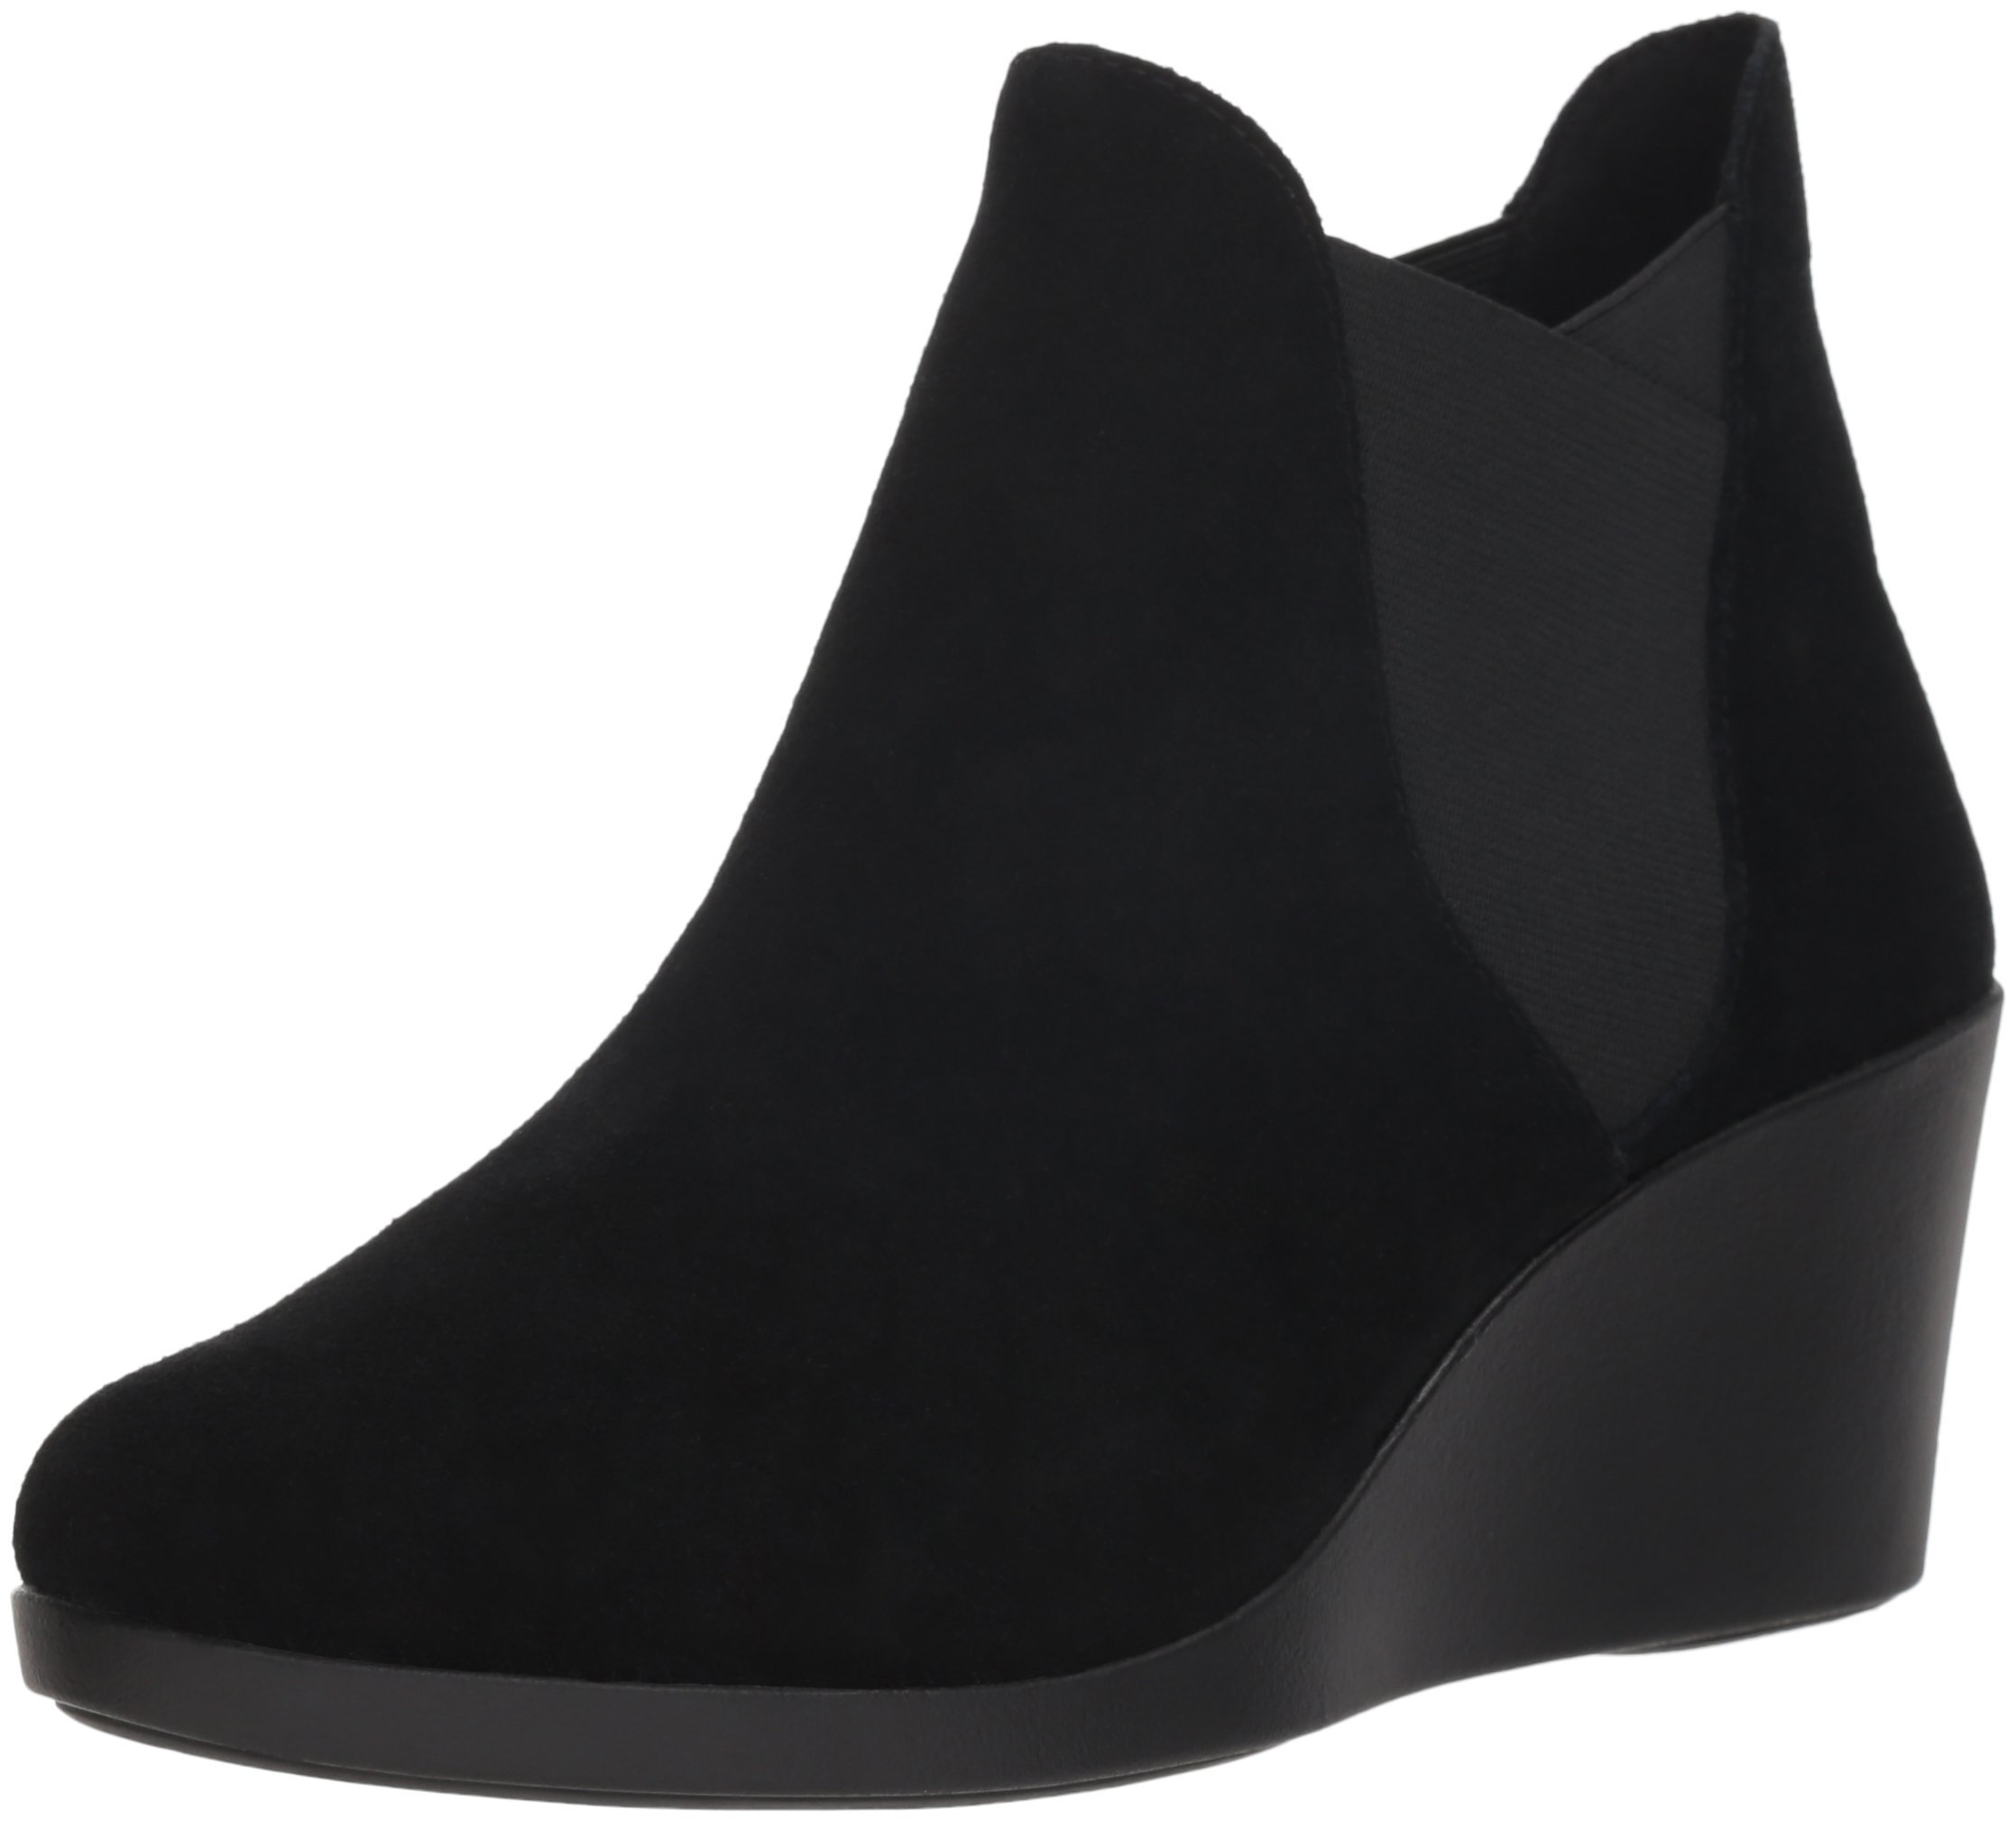 Crocs Women's Leigh Wedge Chelsea W Rain Boot, Black, W8.5 M US